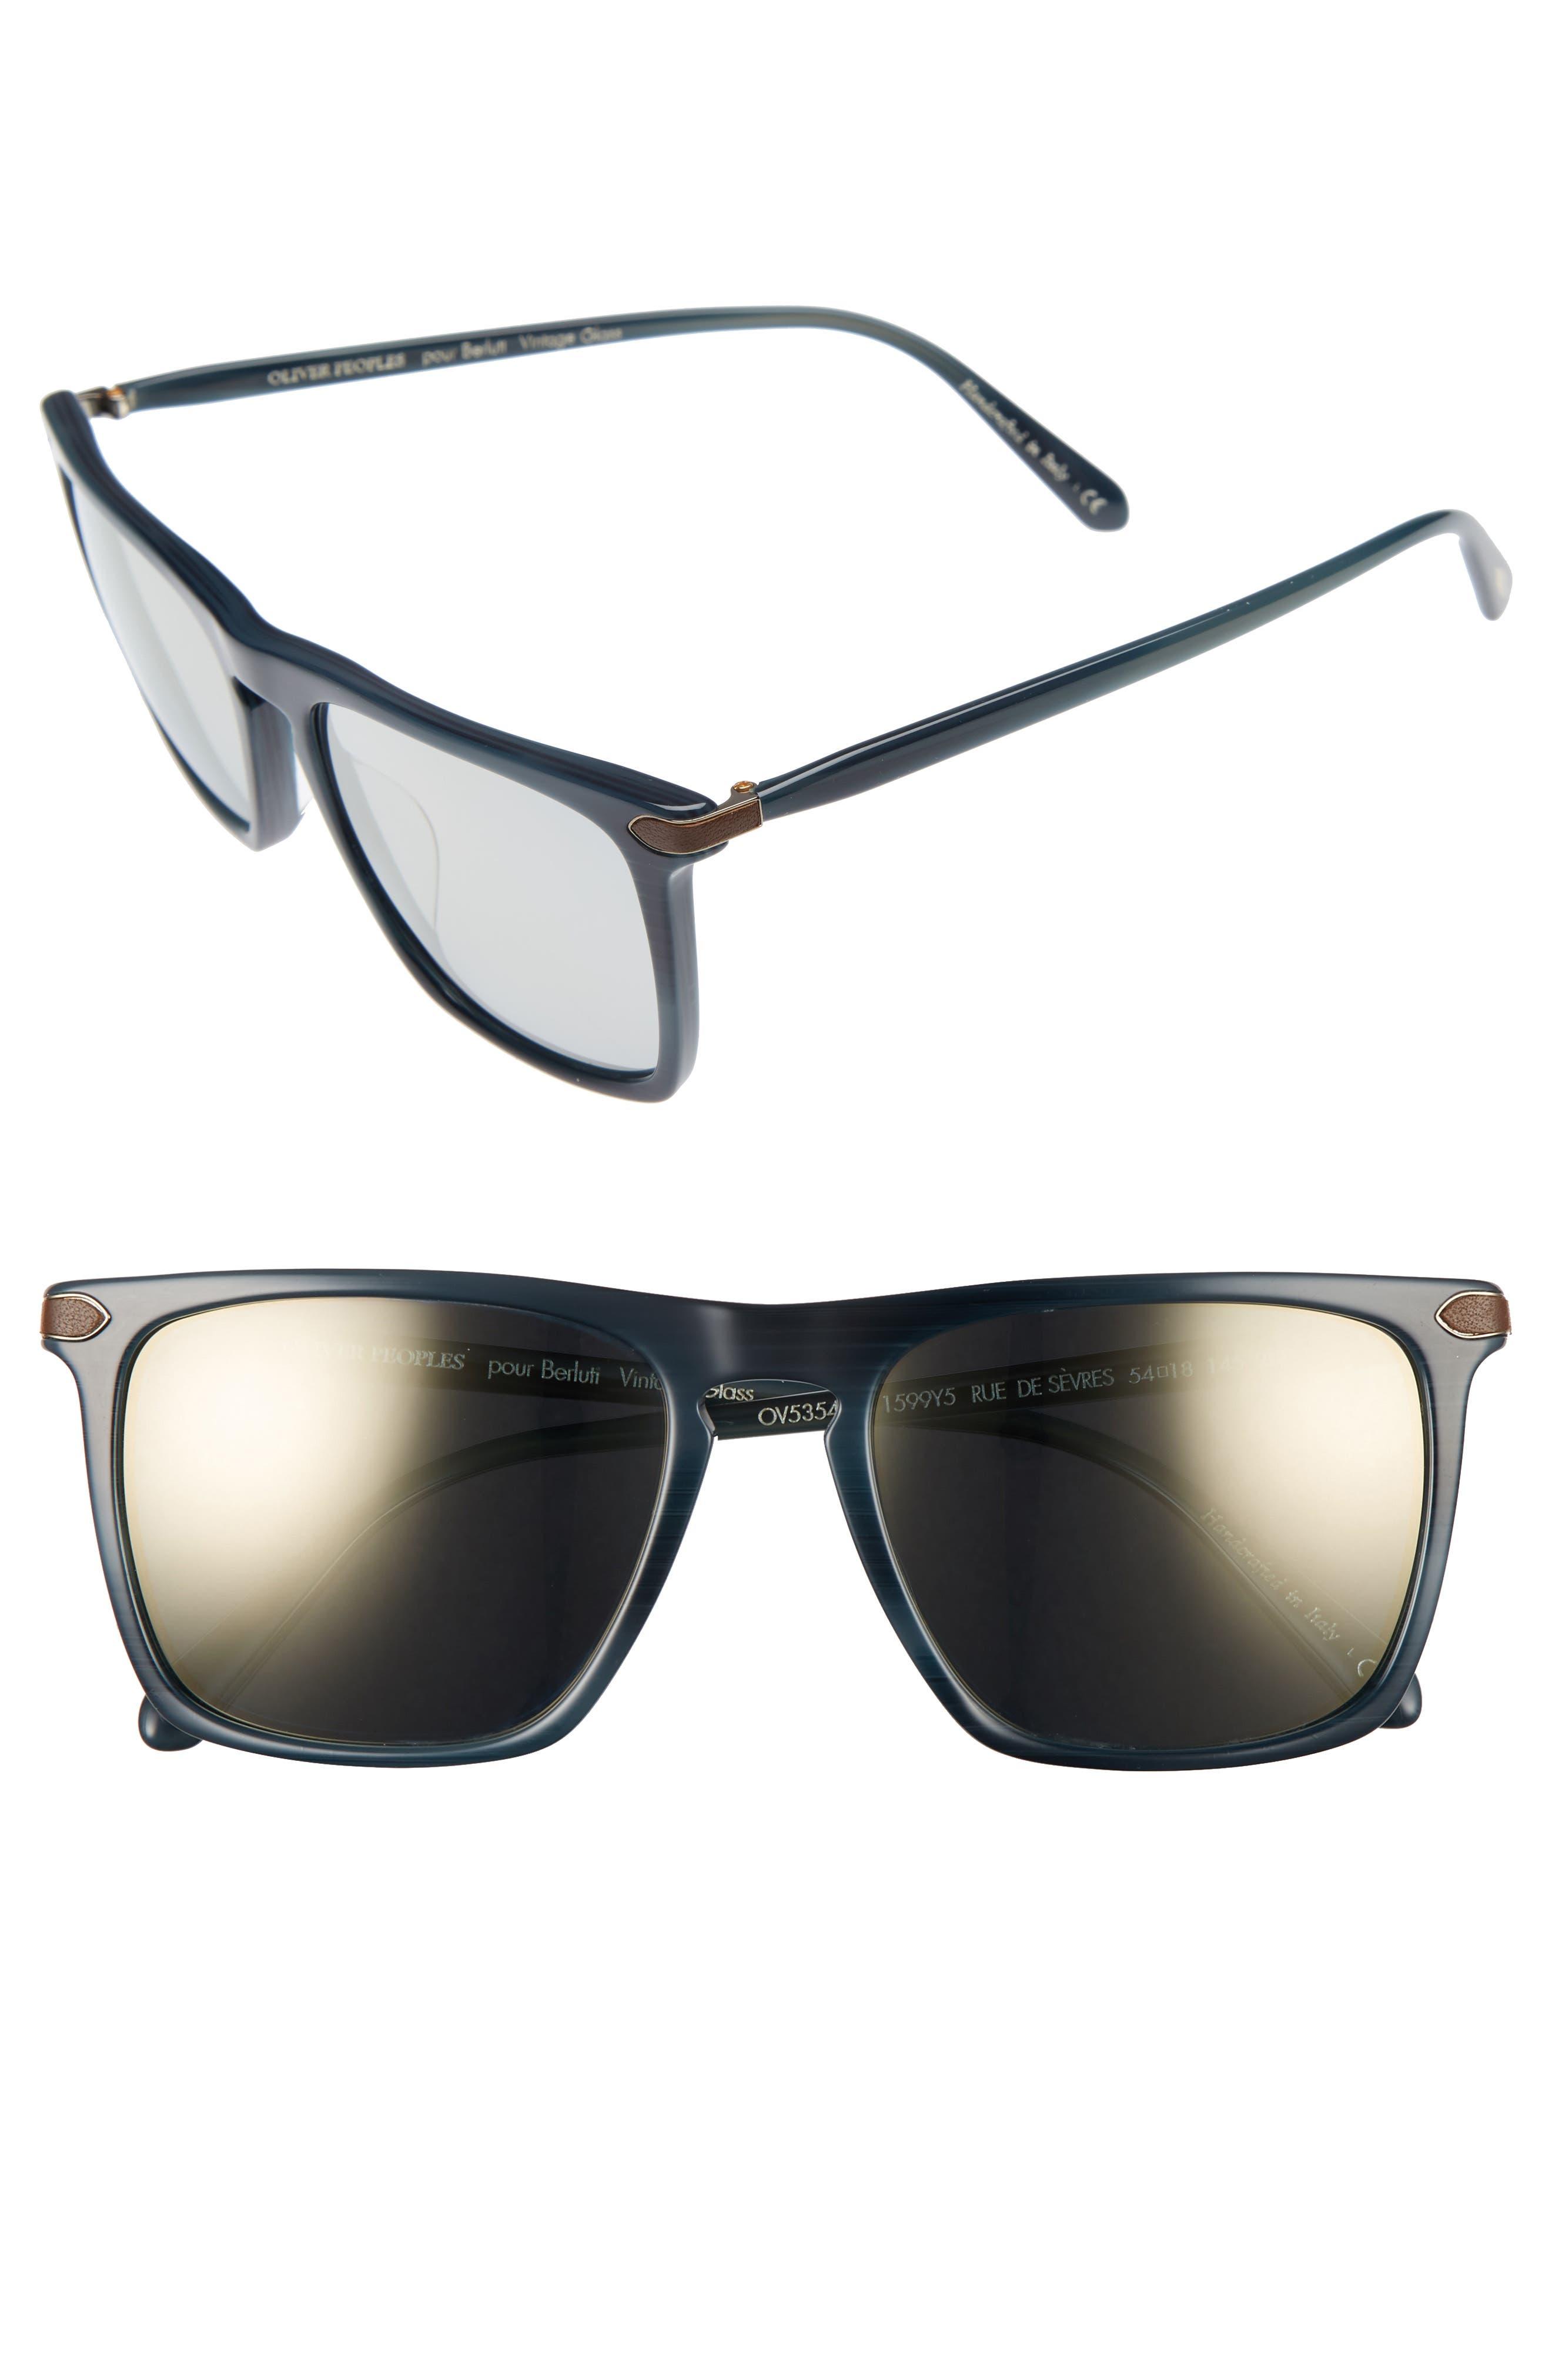 Oliver Peoples Rue De Sevres 54mm Polarized Sunglasses